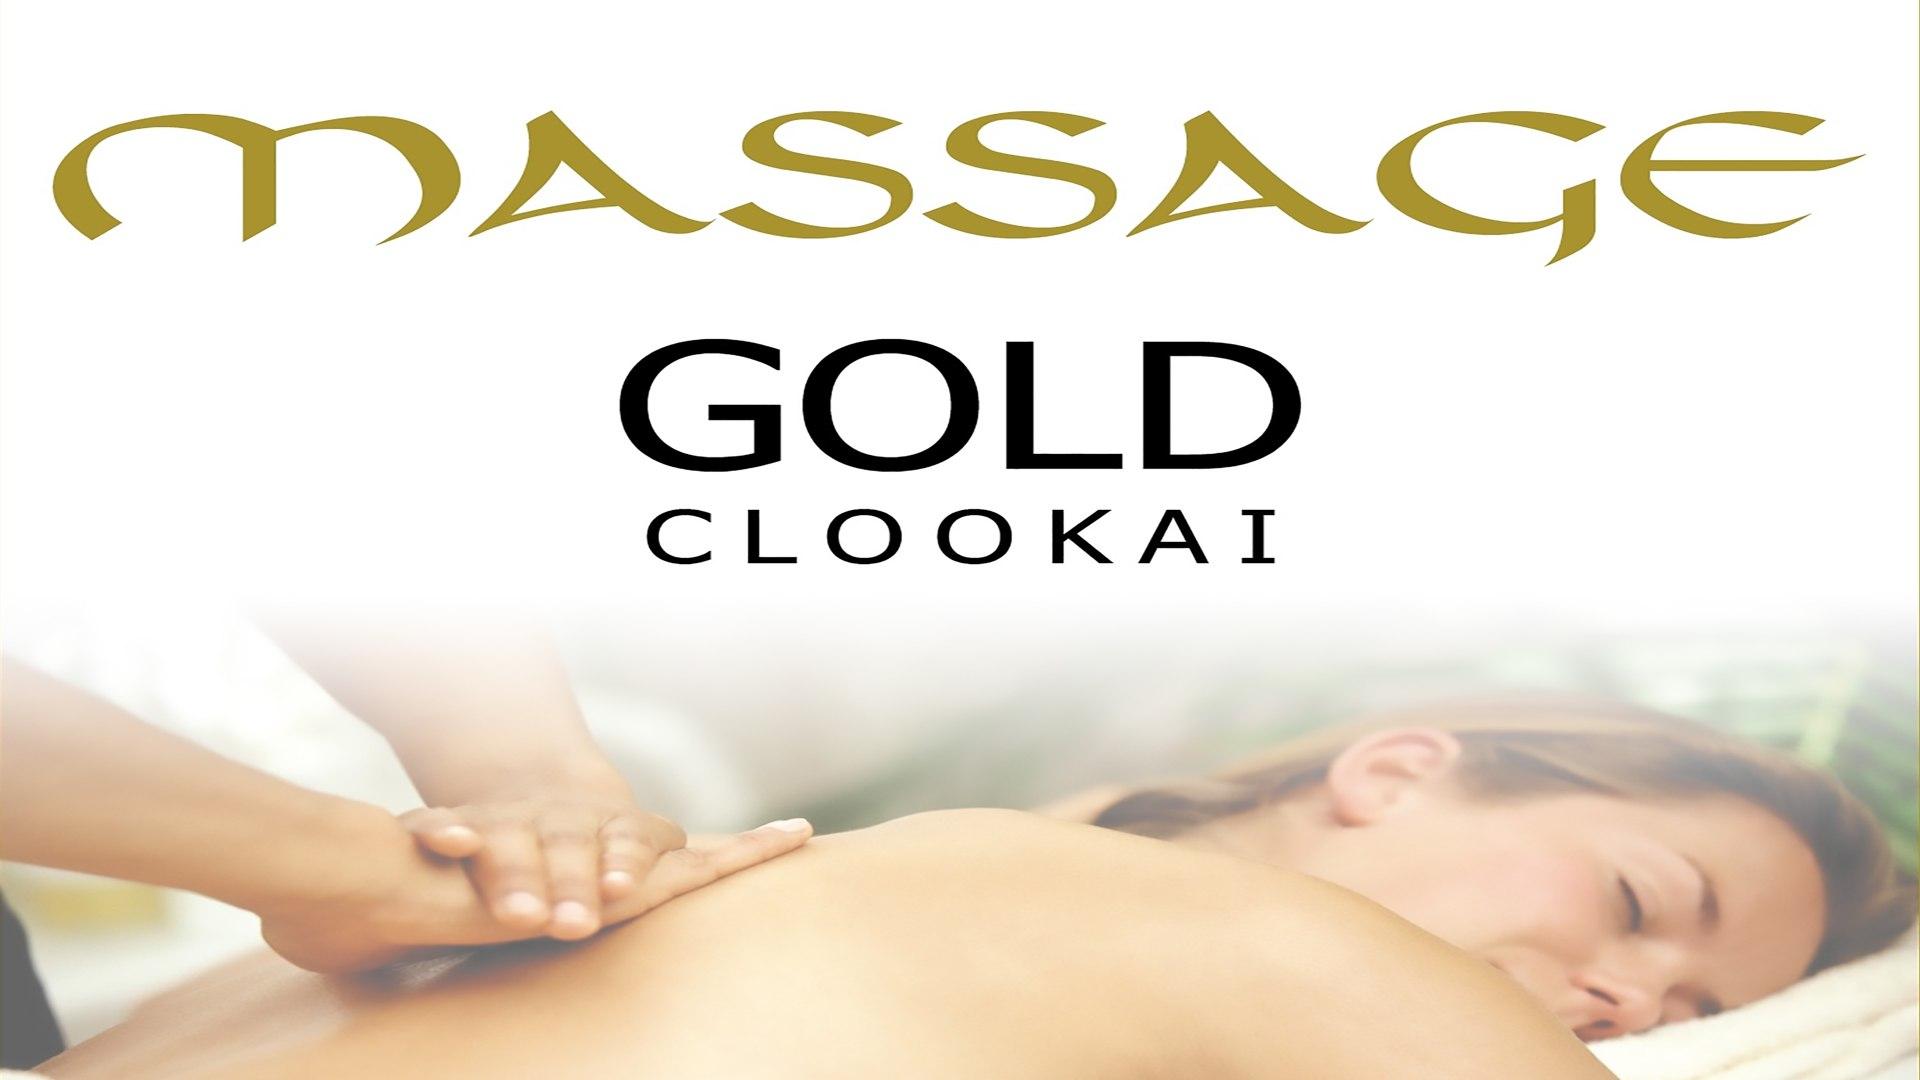 Massage Music, Meditation, Sleep & SPA Music, Deep Relaxation Music